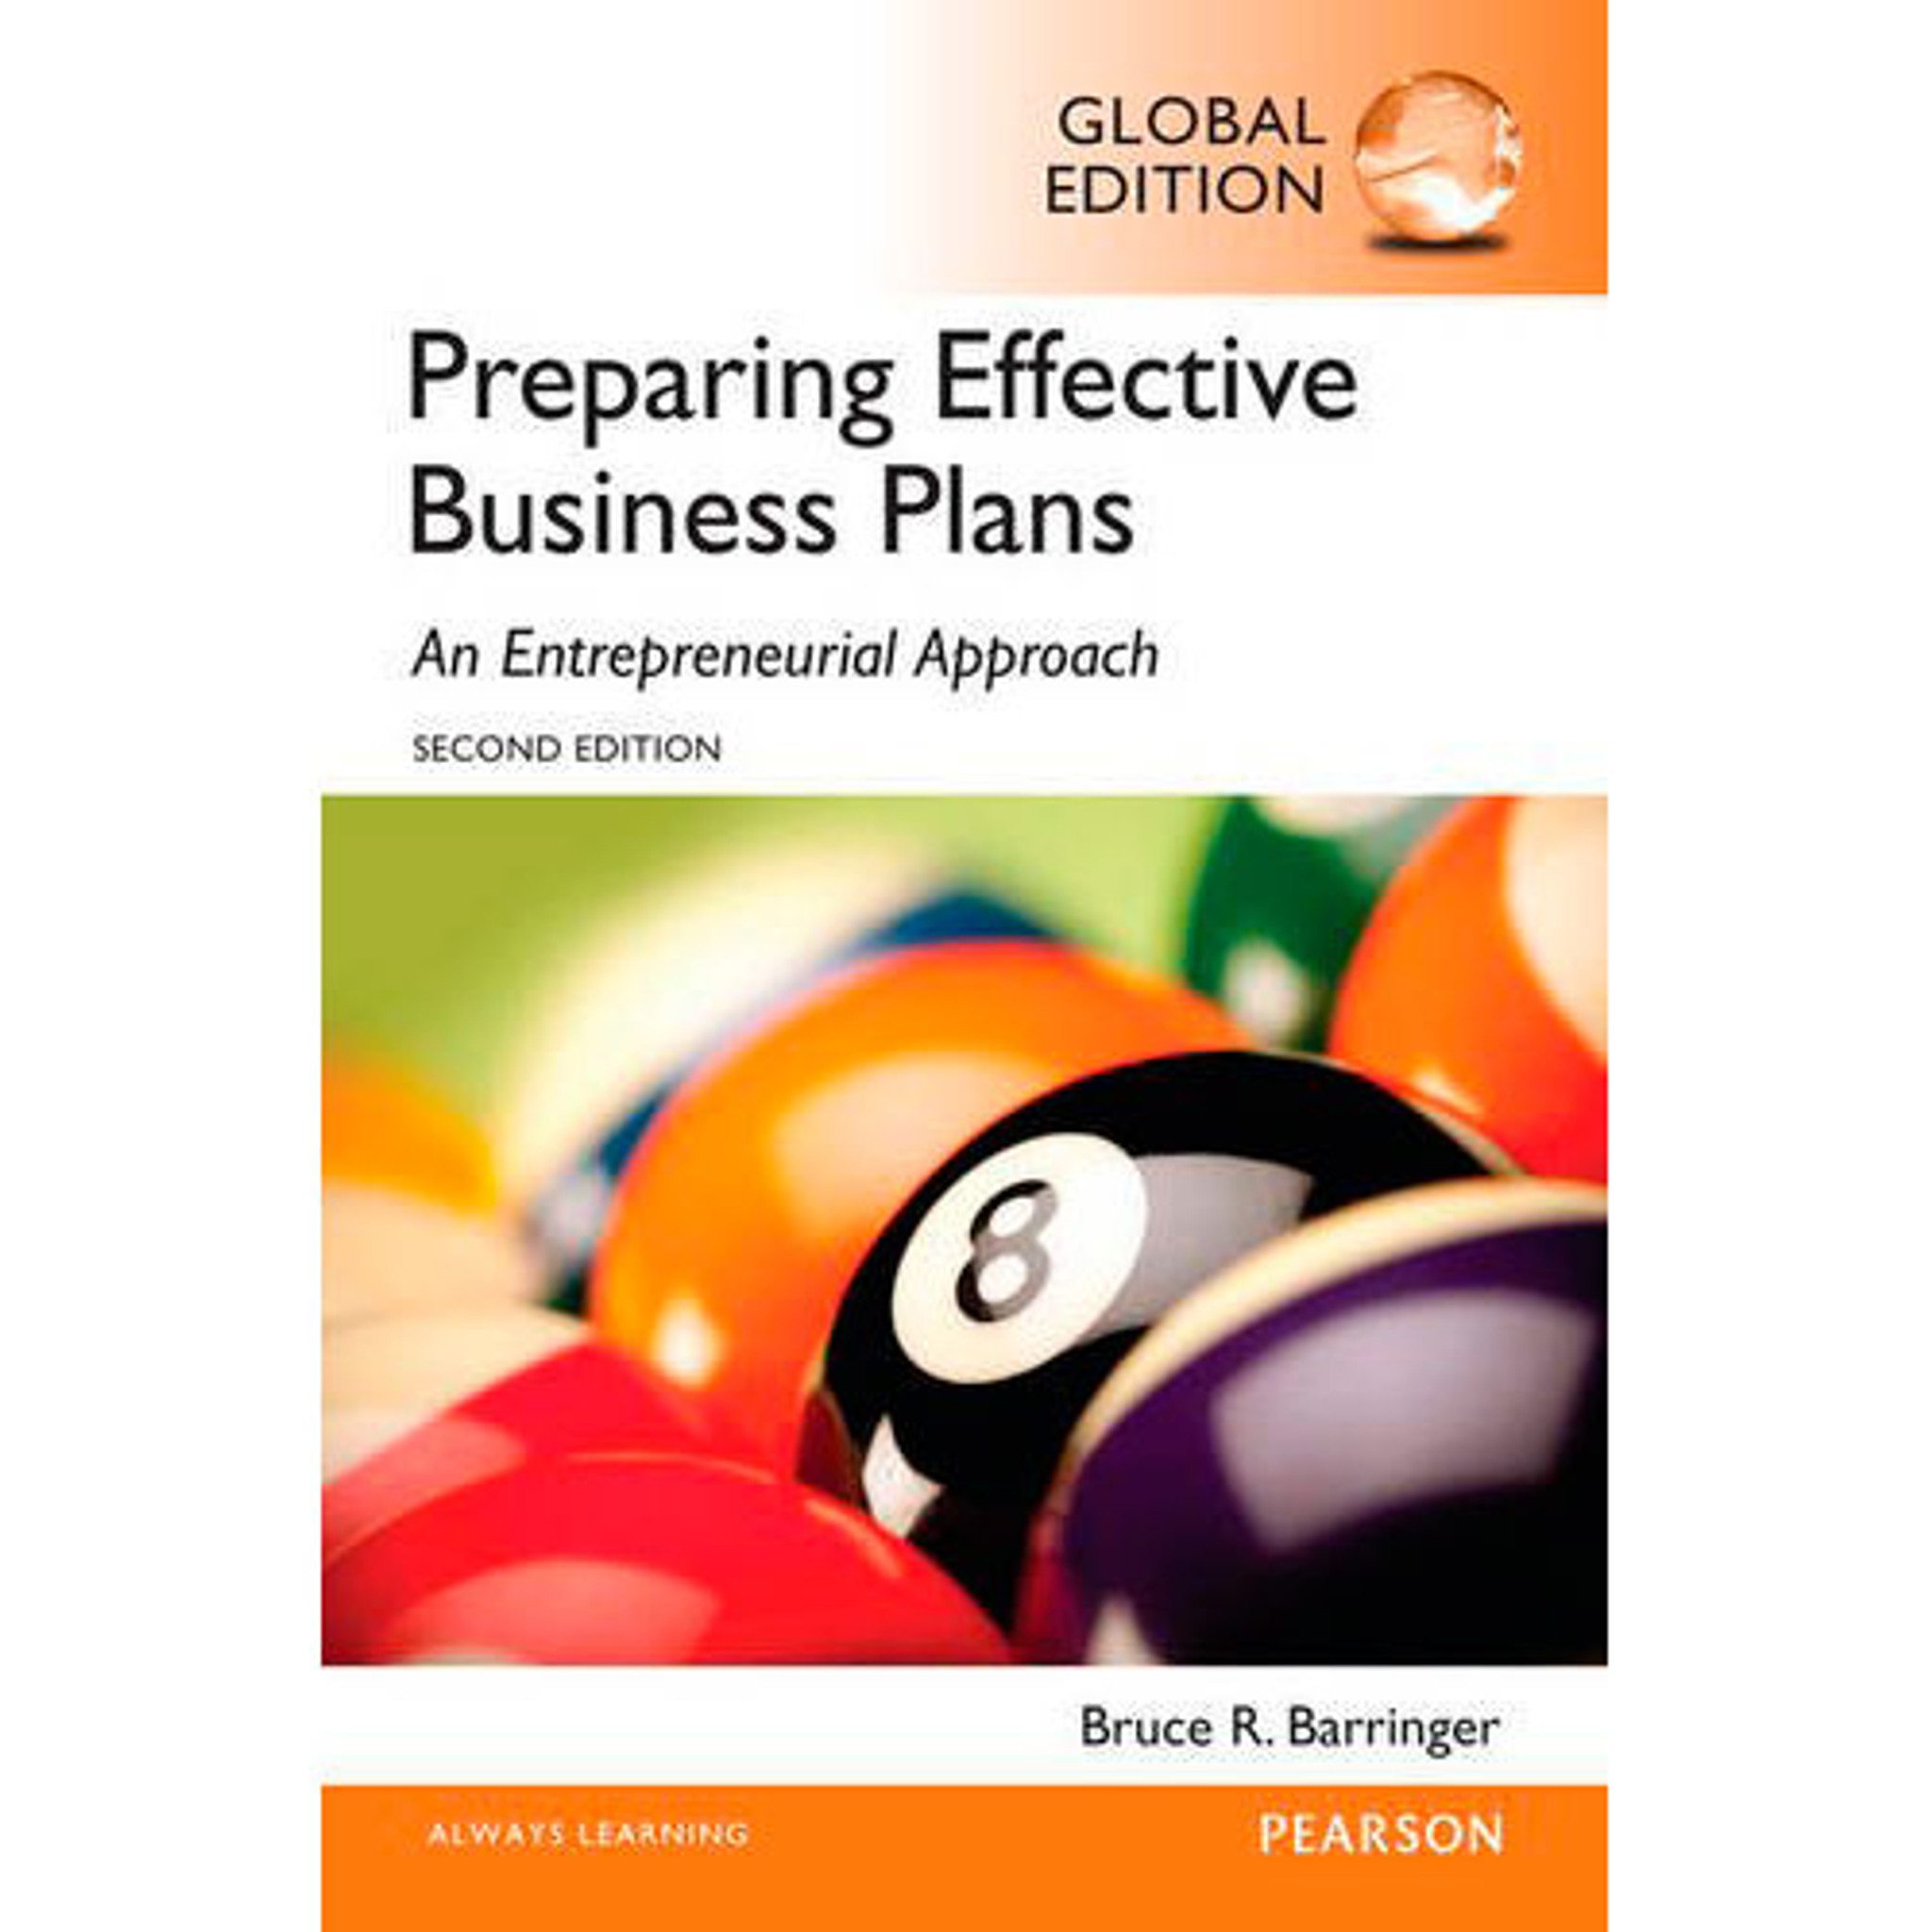 Preparing Effective Business Plans:An Entrepreneurial Approach: International Edition